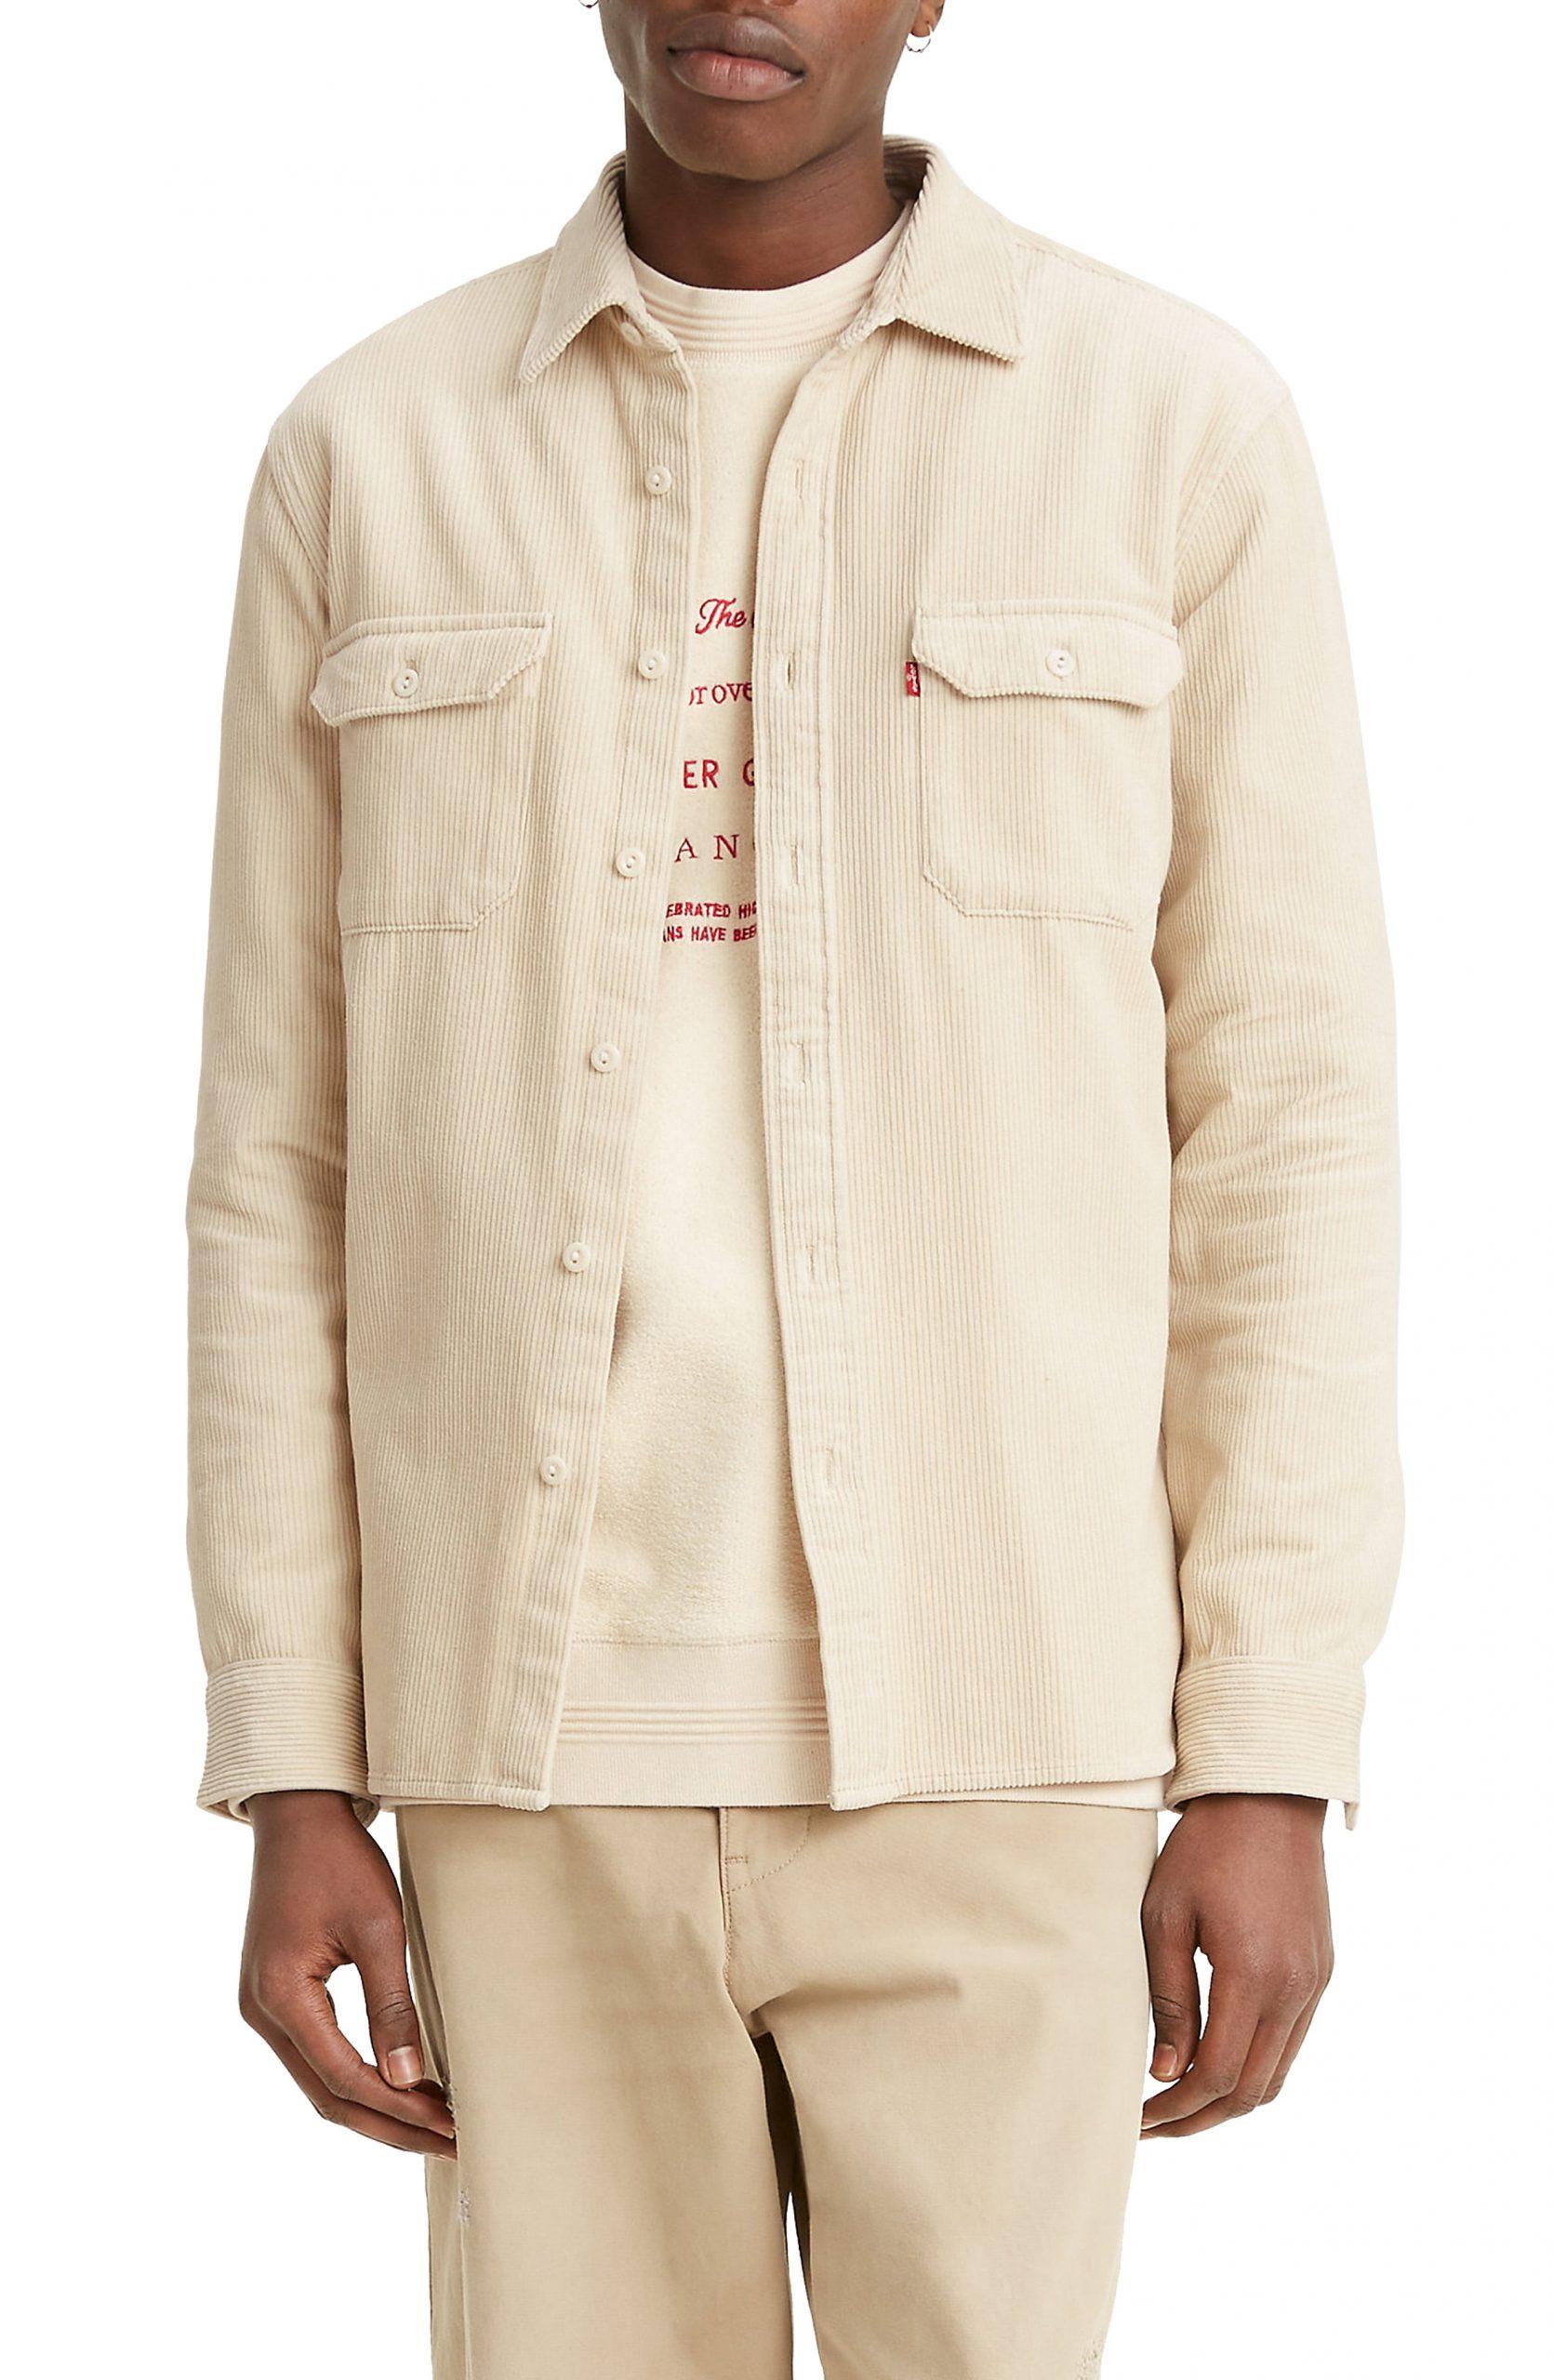 Men's Levi's Jackson Worker Corduroy Button-Up Overshirt, Size X-Large R - Brown